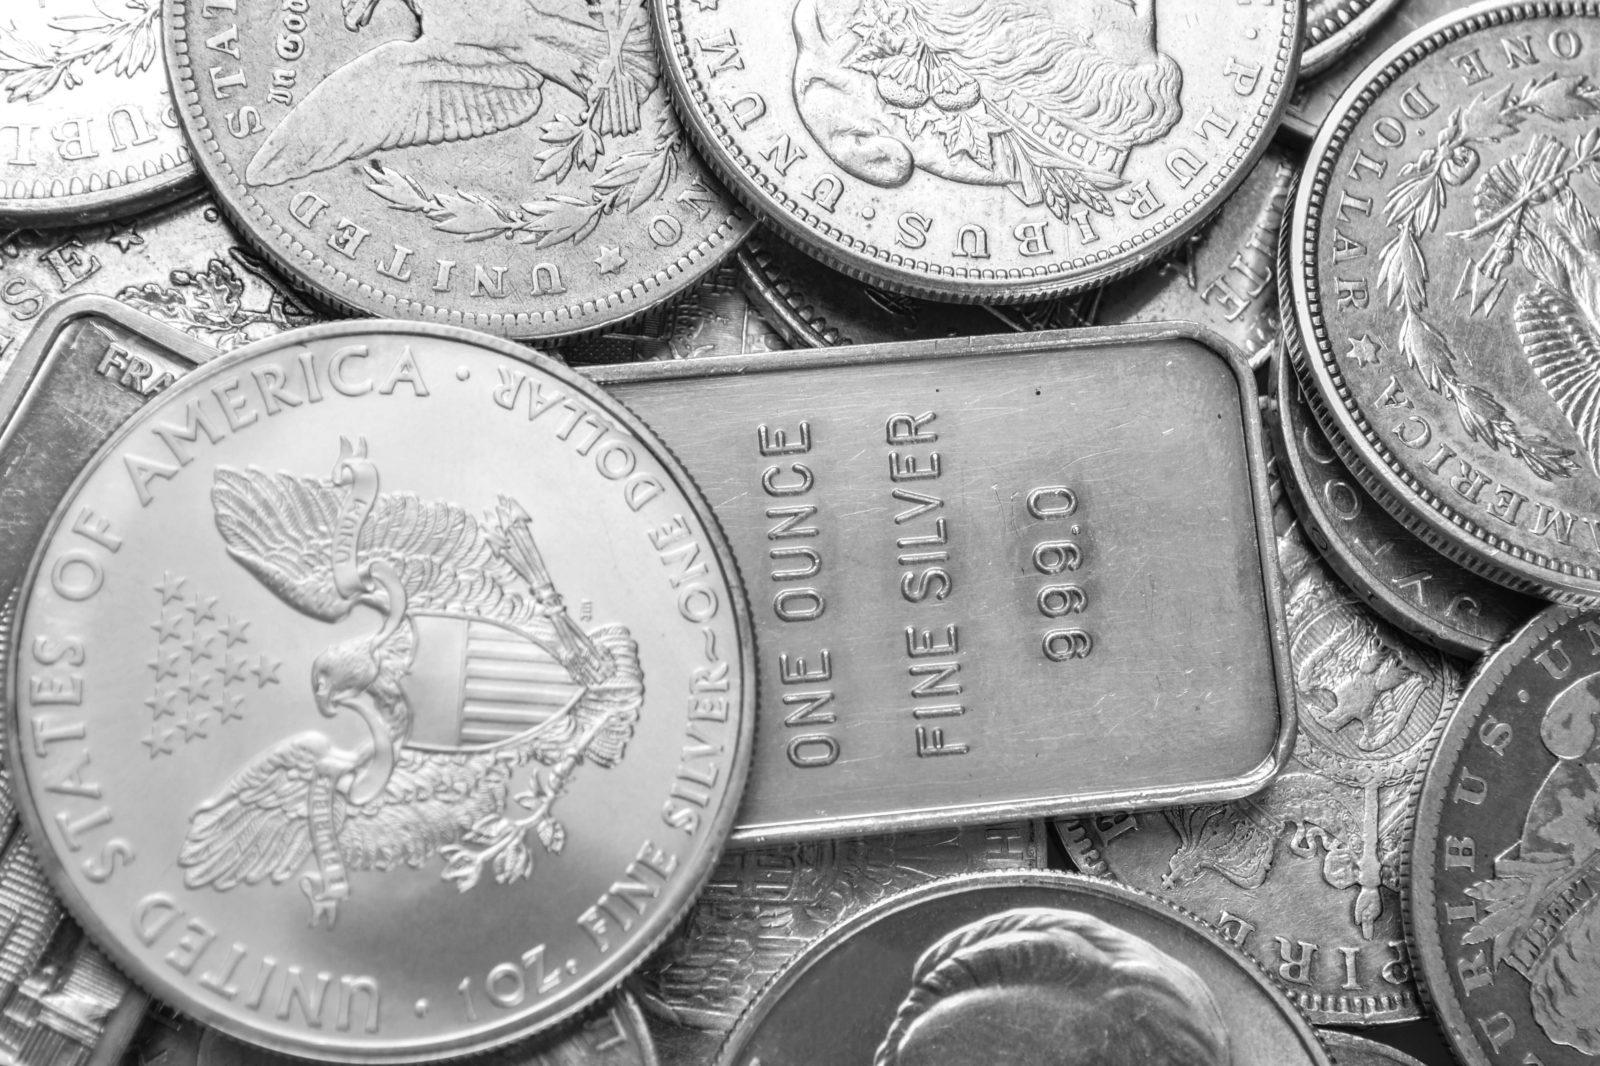 цена серебра